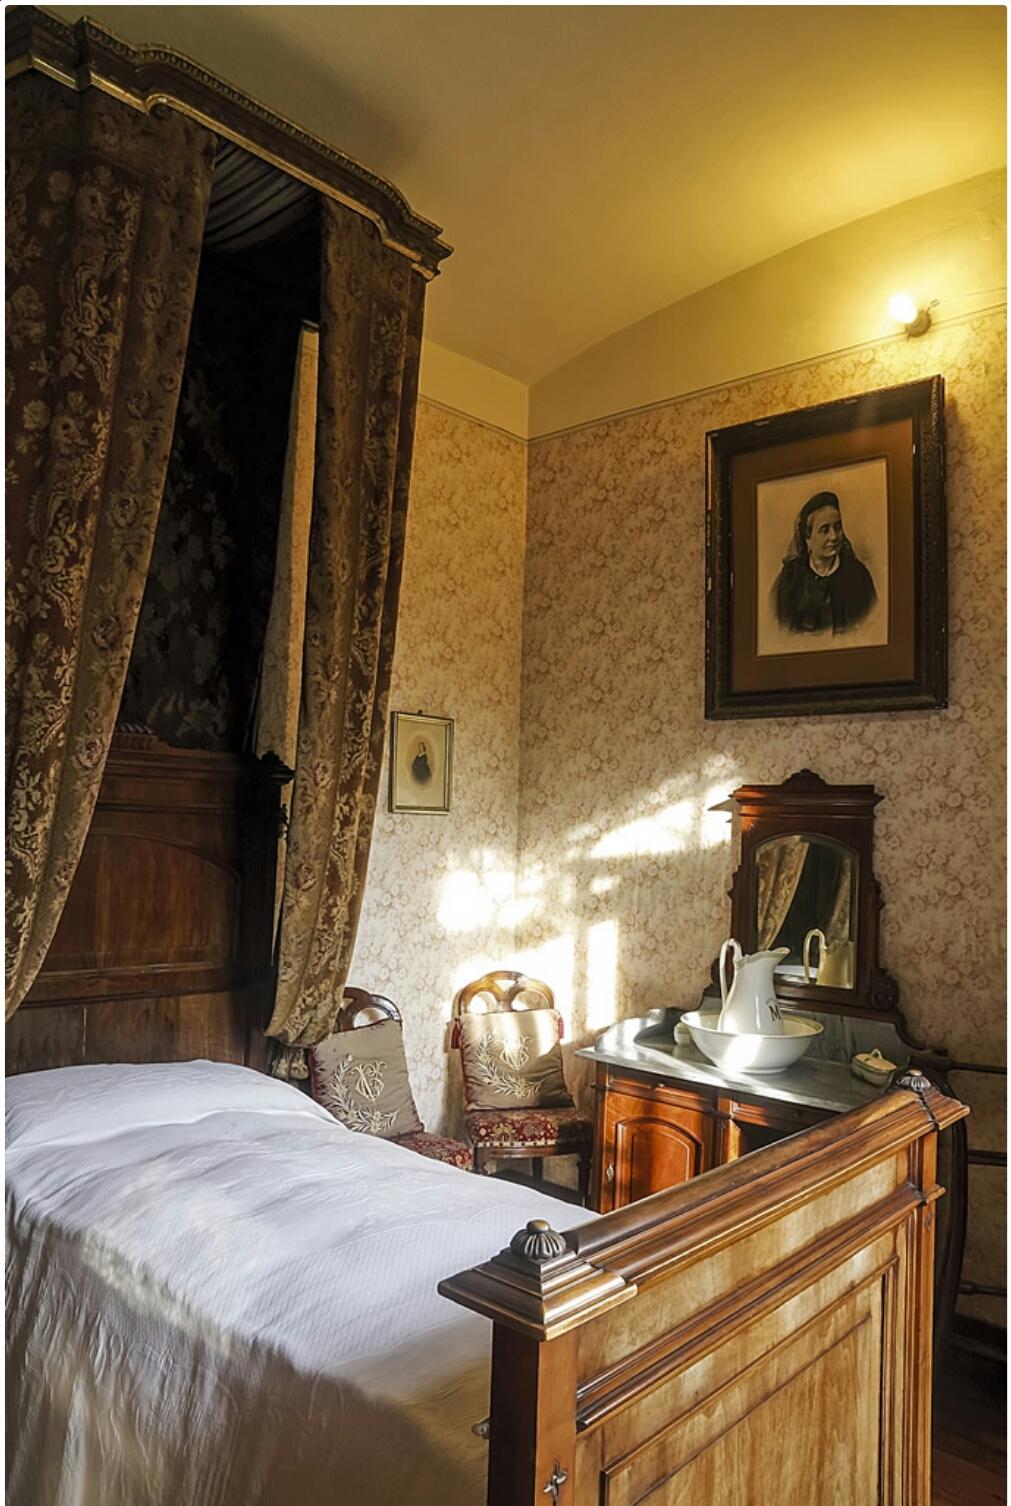 Grand Hotel de Milan